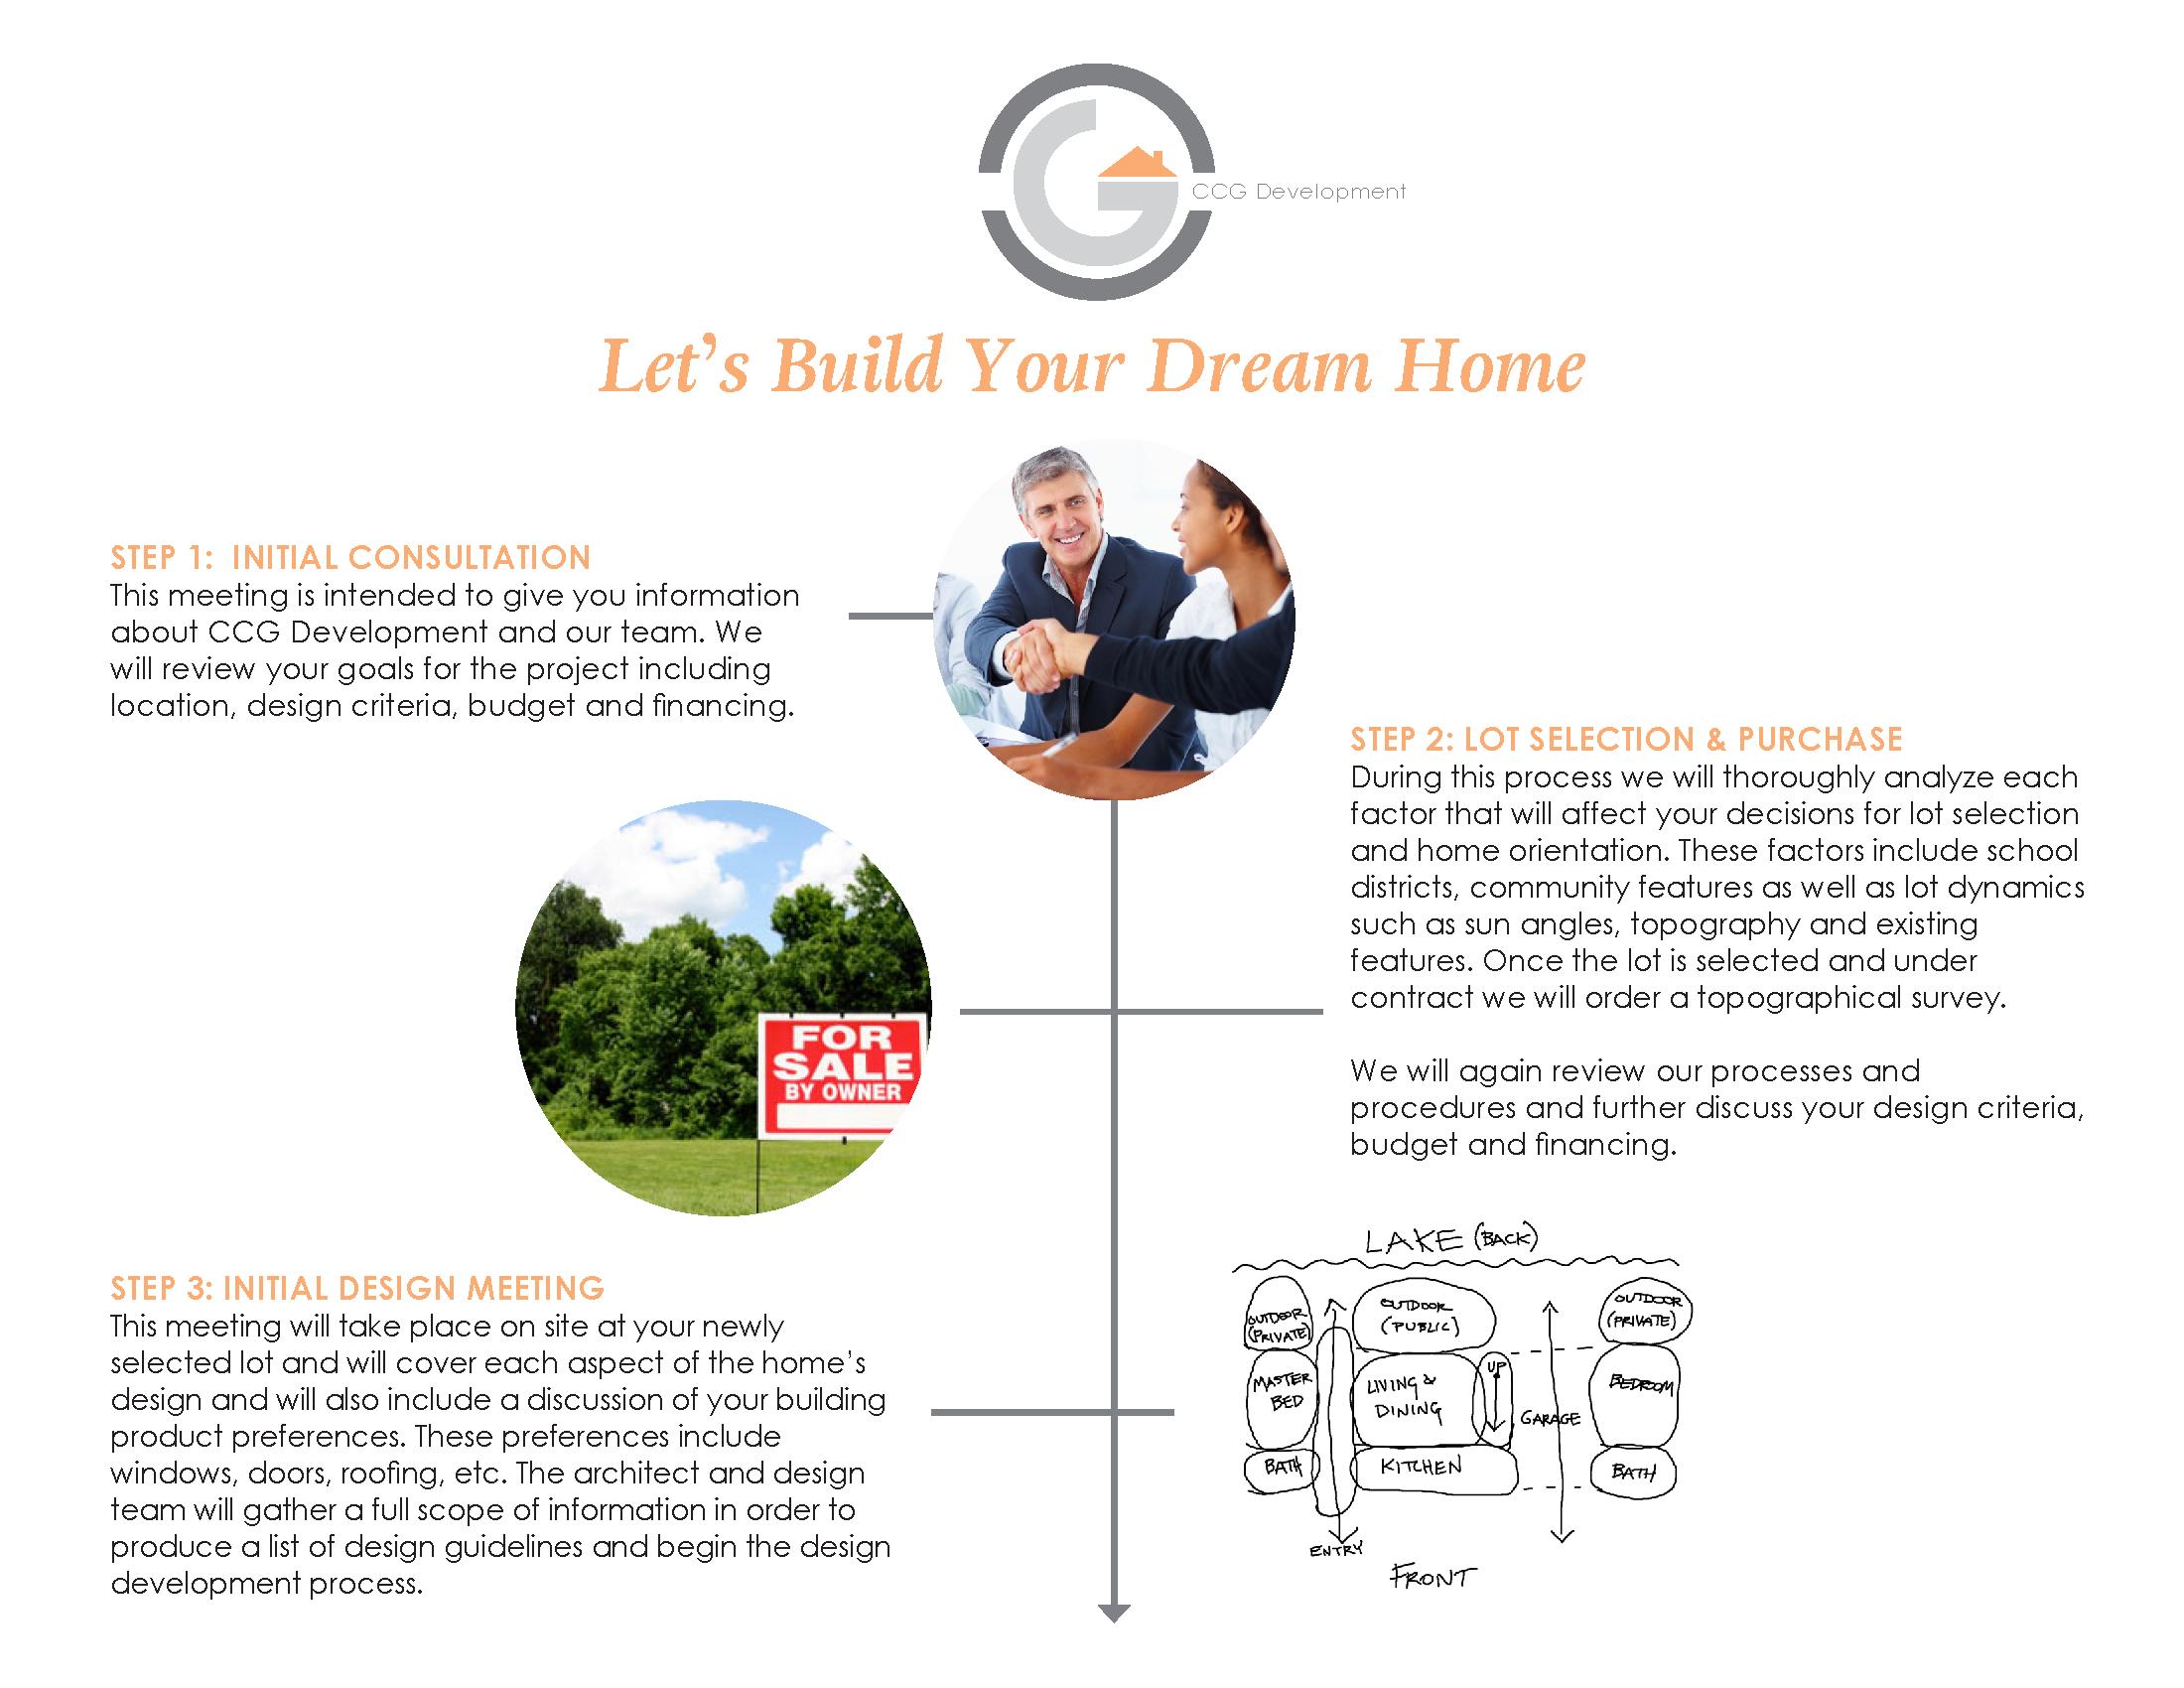 CCG Development Custom Home Process Chart V2 - Slides_Page_1.png